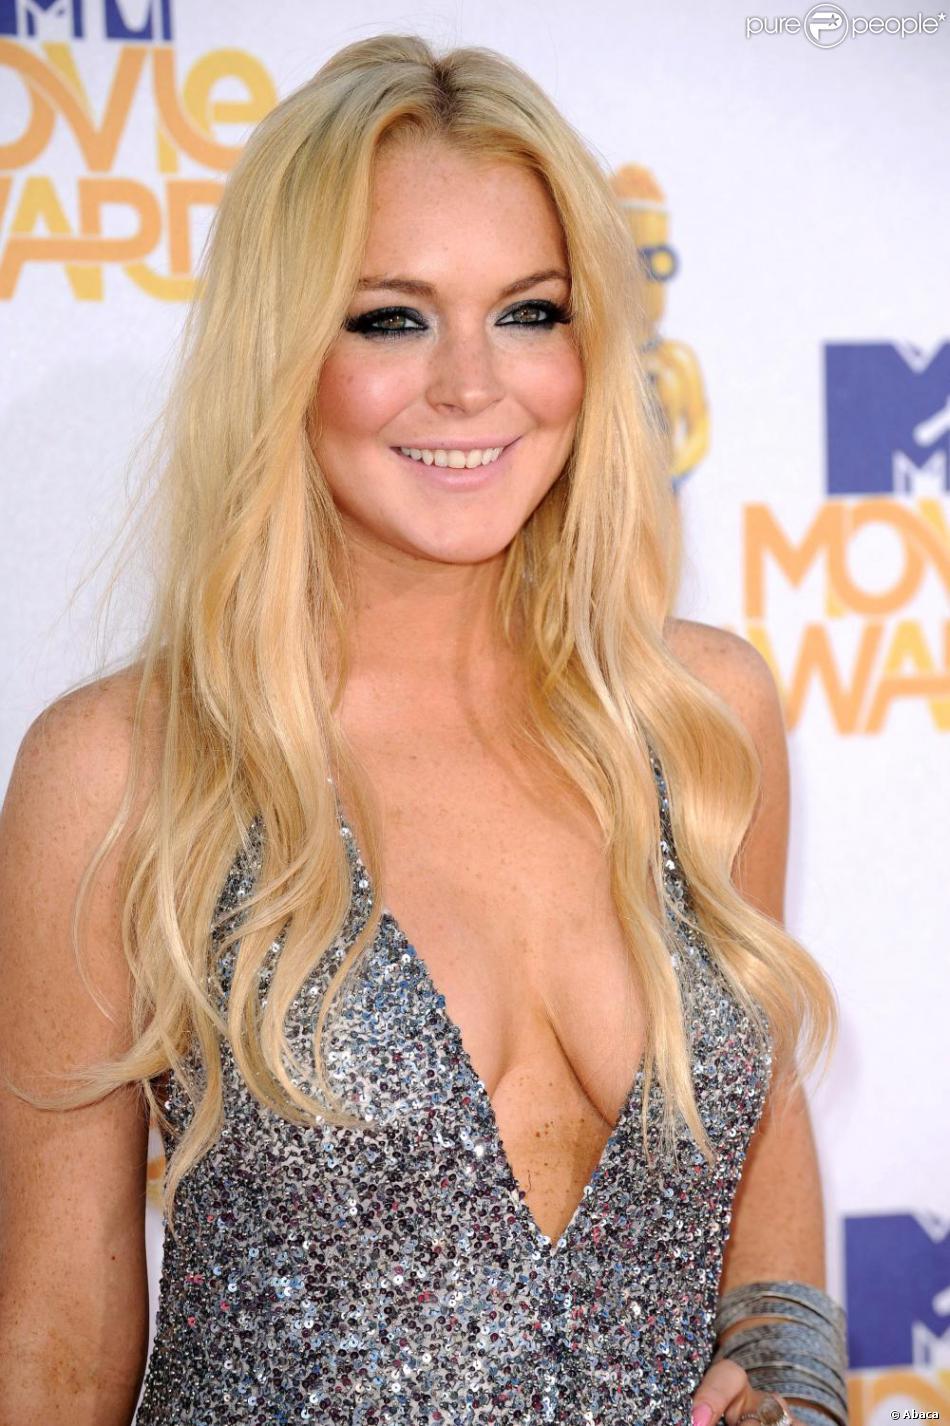 Lindsay lohan robe de poitrine de choix